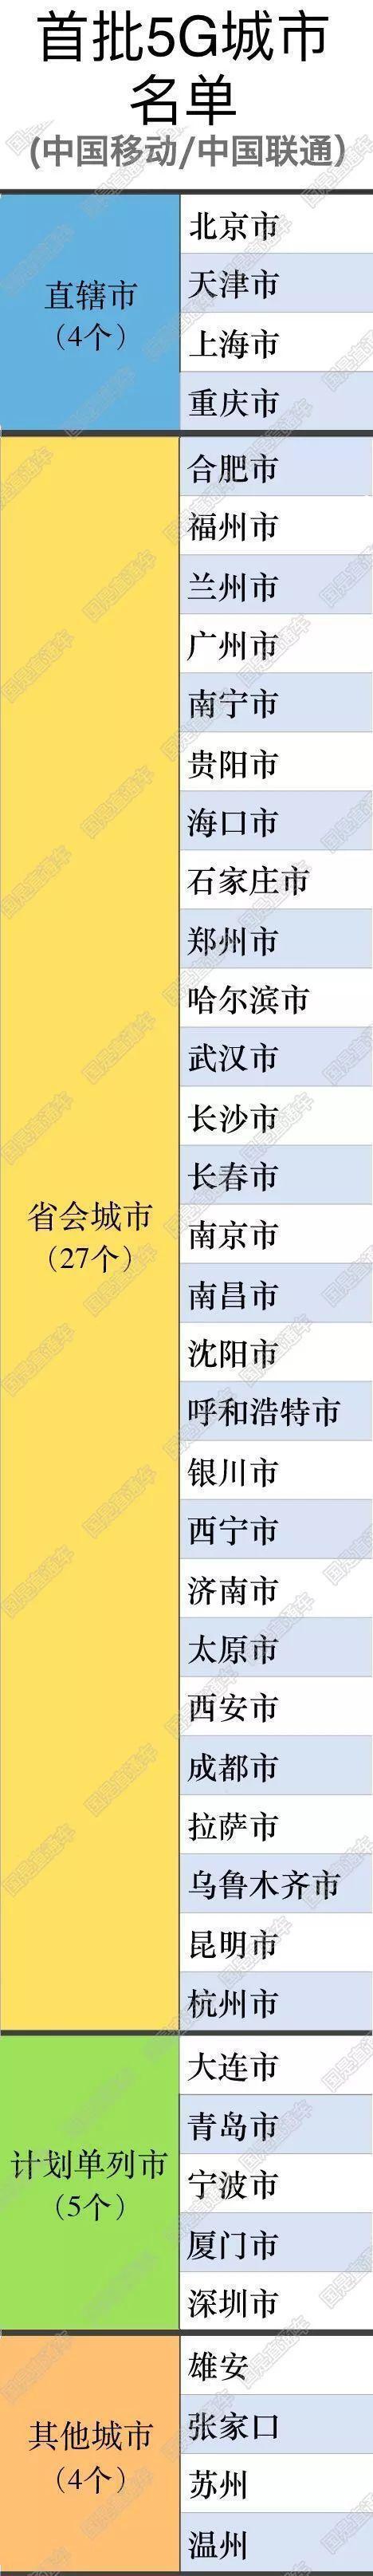 5G城市名单公布 40城将率先获益   _中欧新闻_欧洲中文网